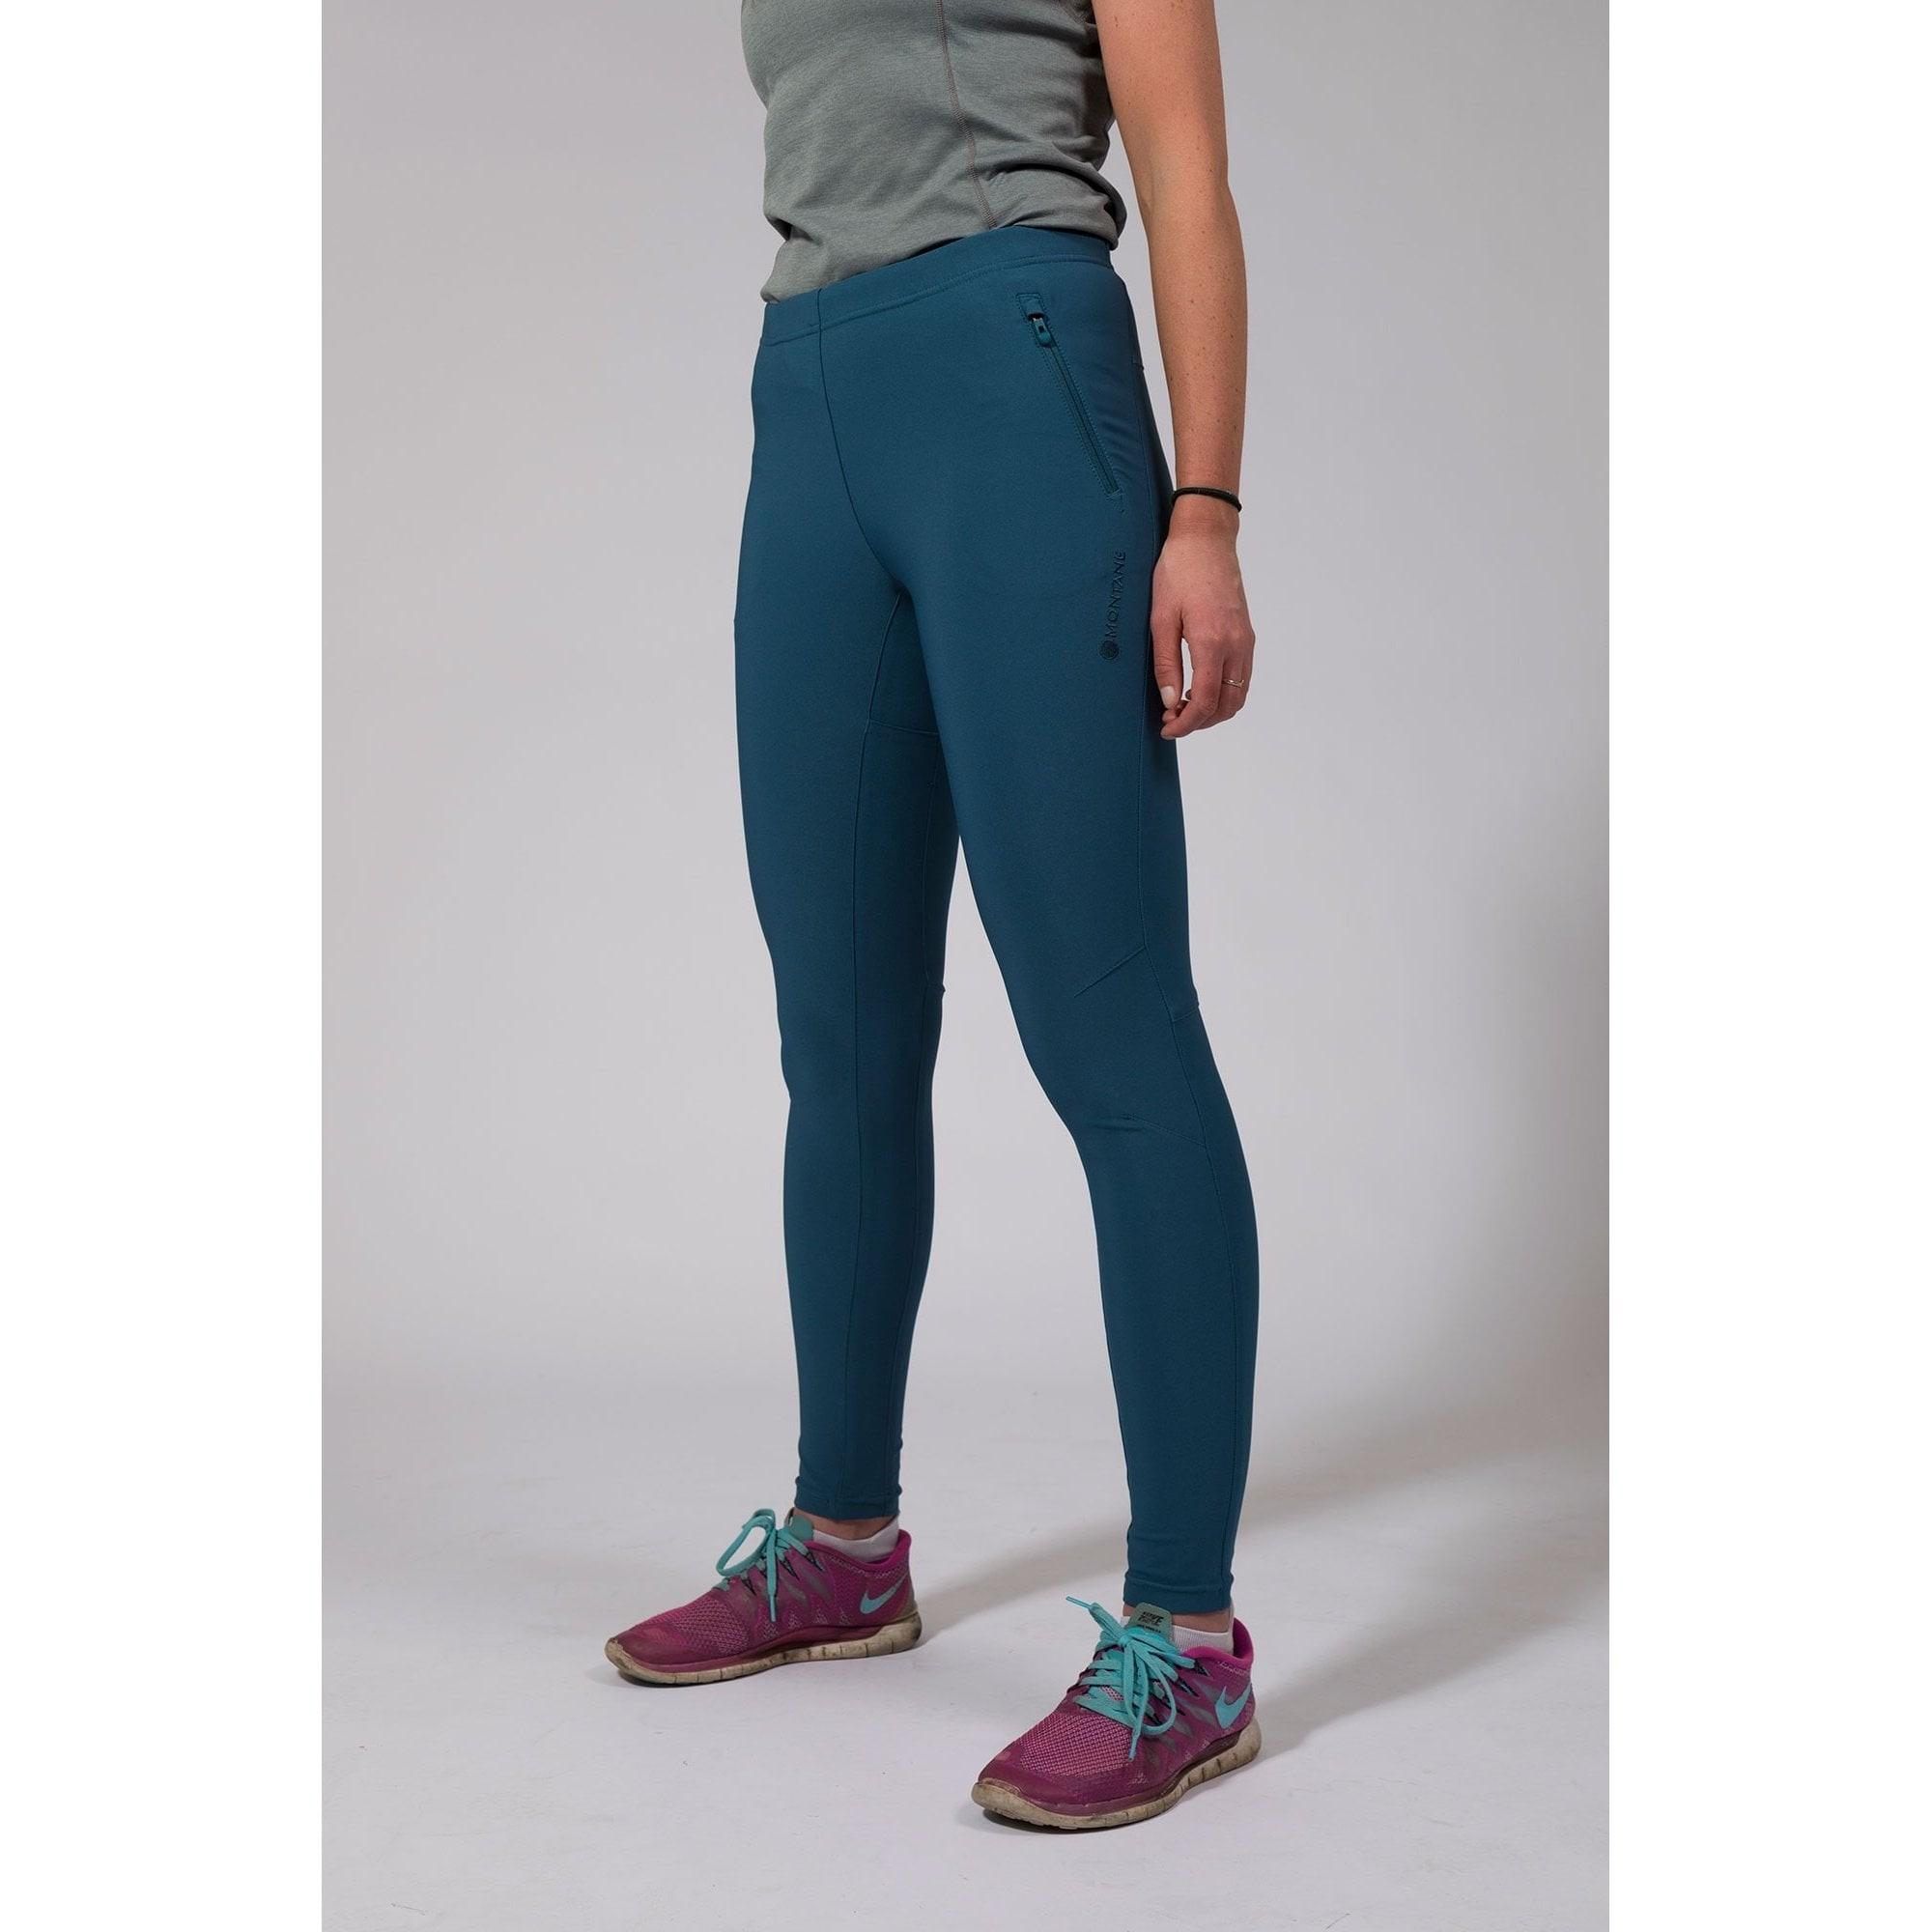 Montane Women's Ineo Pro Pants - Zanskar Blue